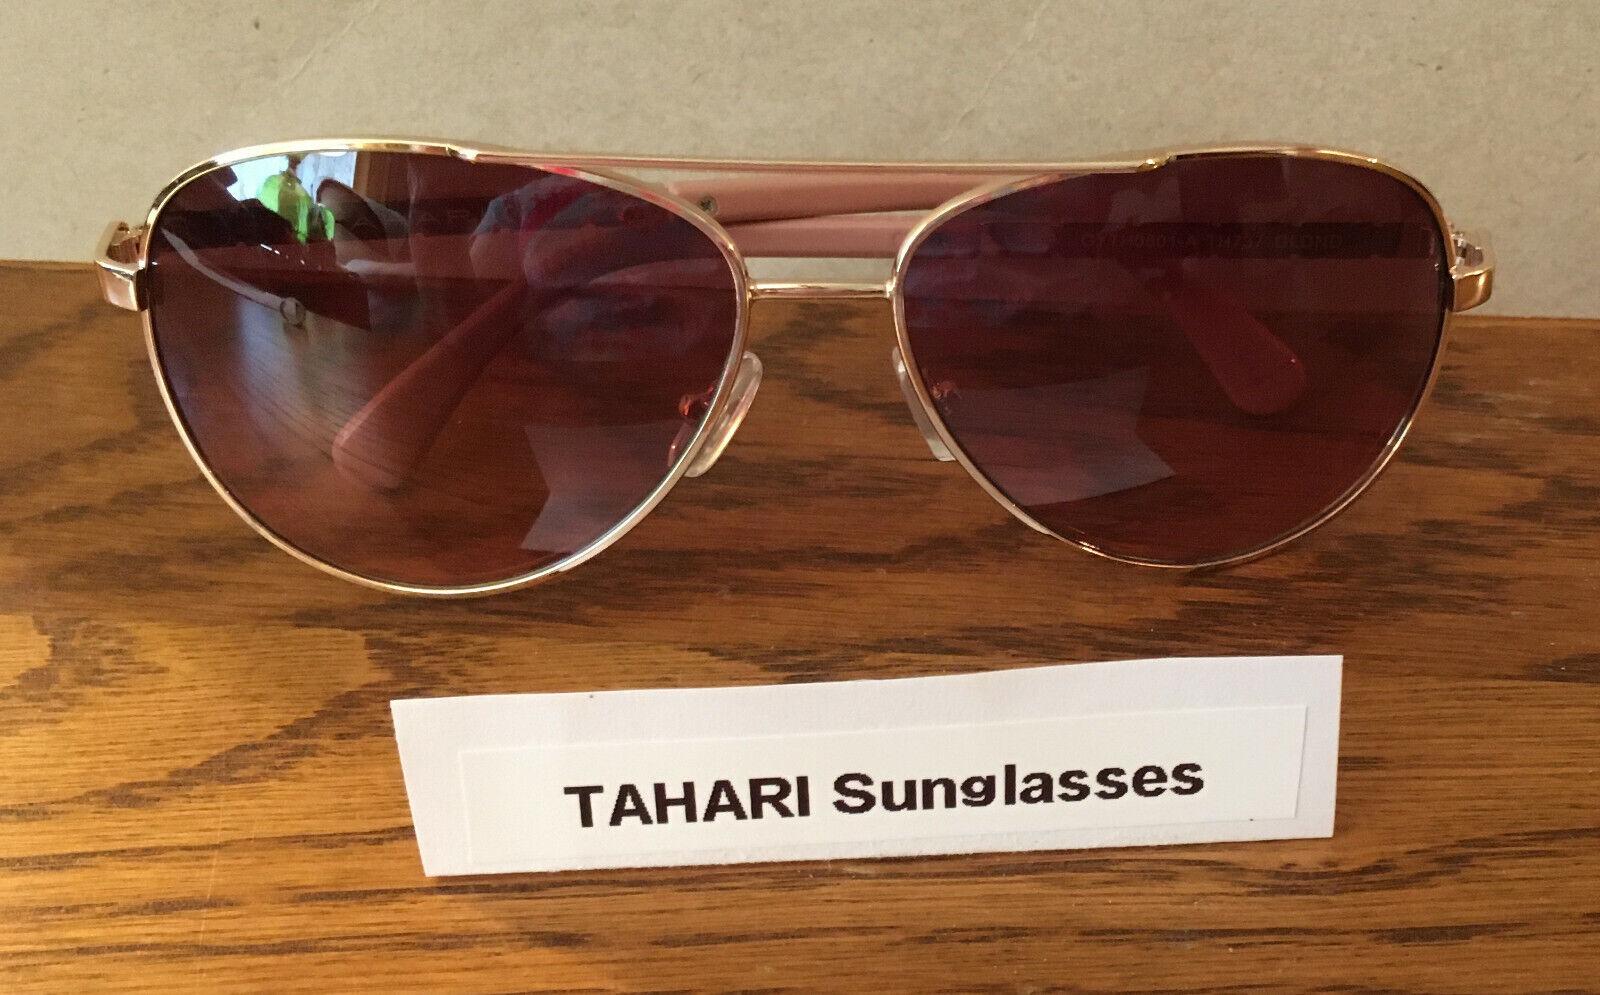 TAHARI Women's Aviator Sunglasses TH737 UV Protective with Rhinestone Crystals